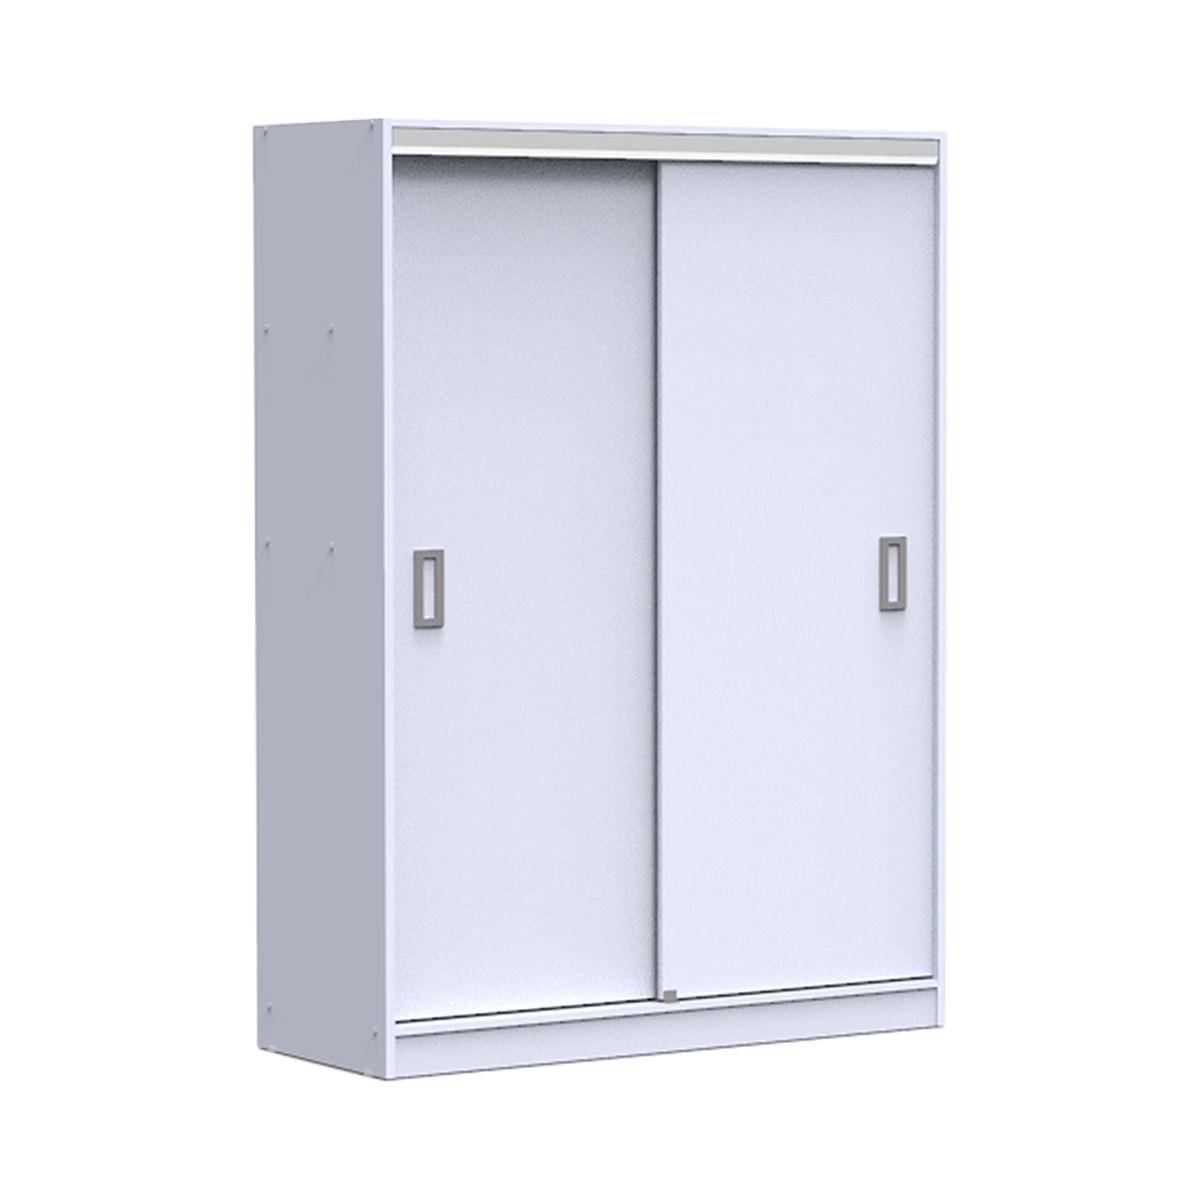 placard-2-puertas